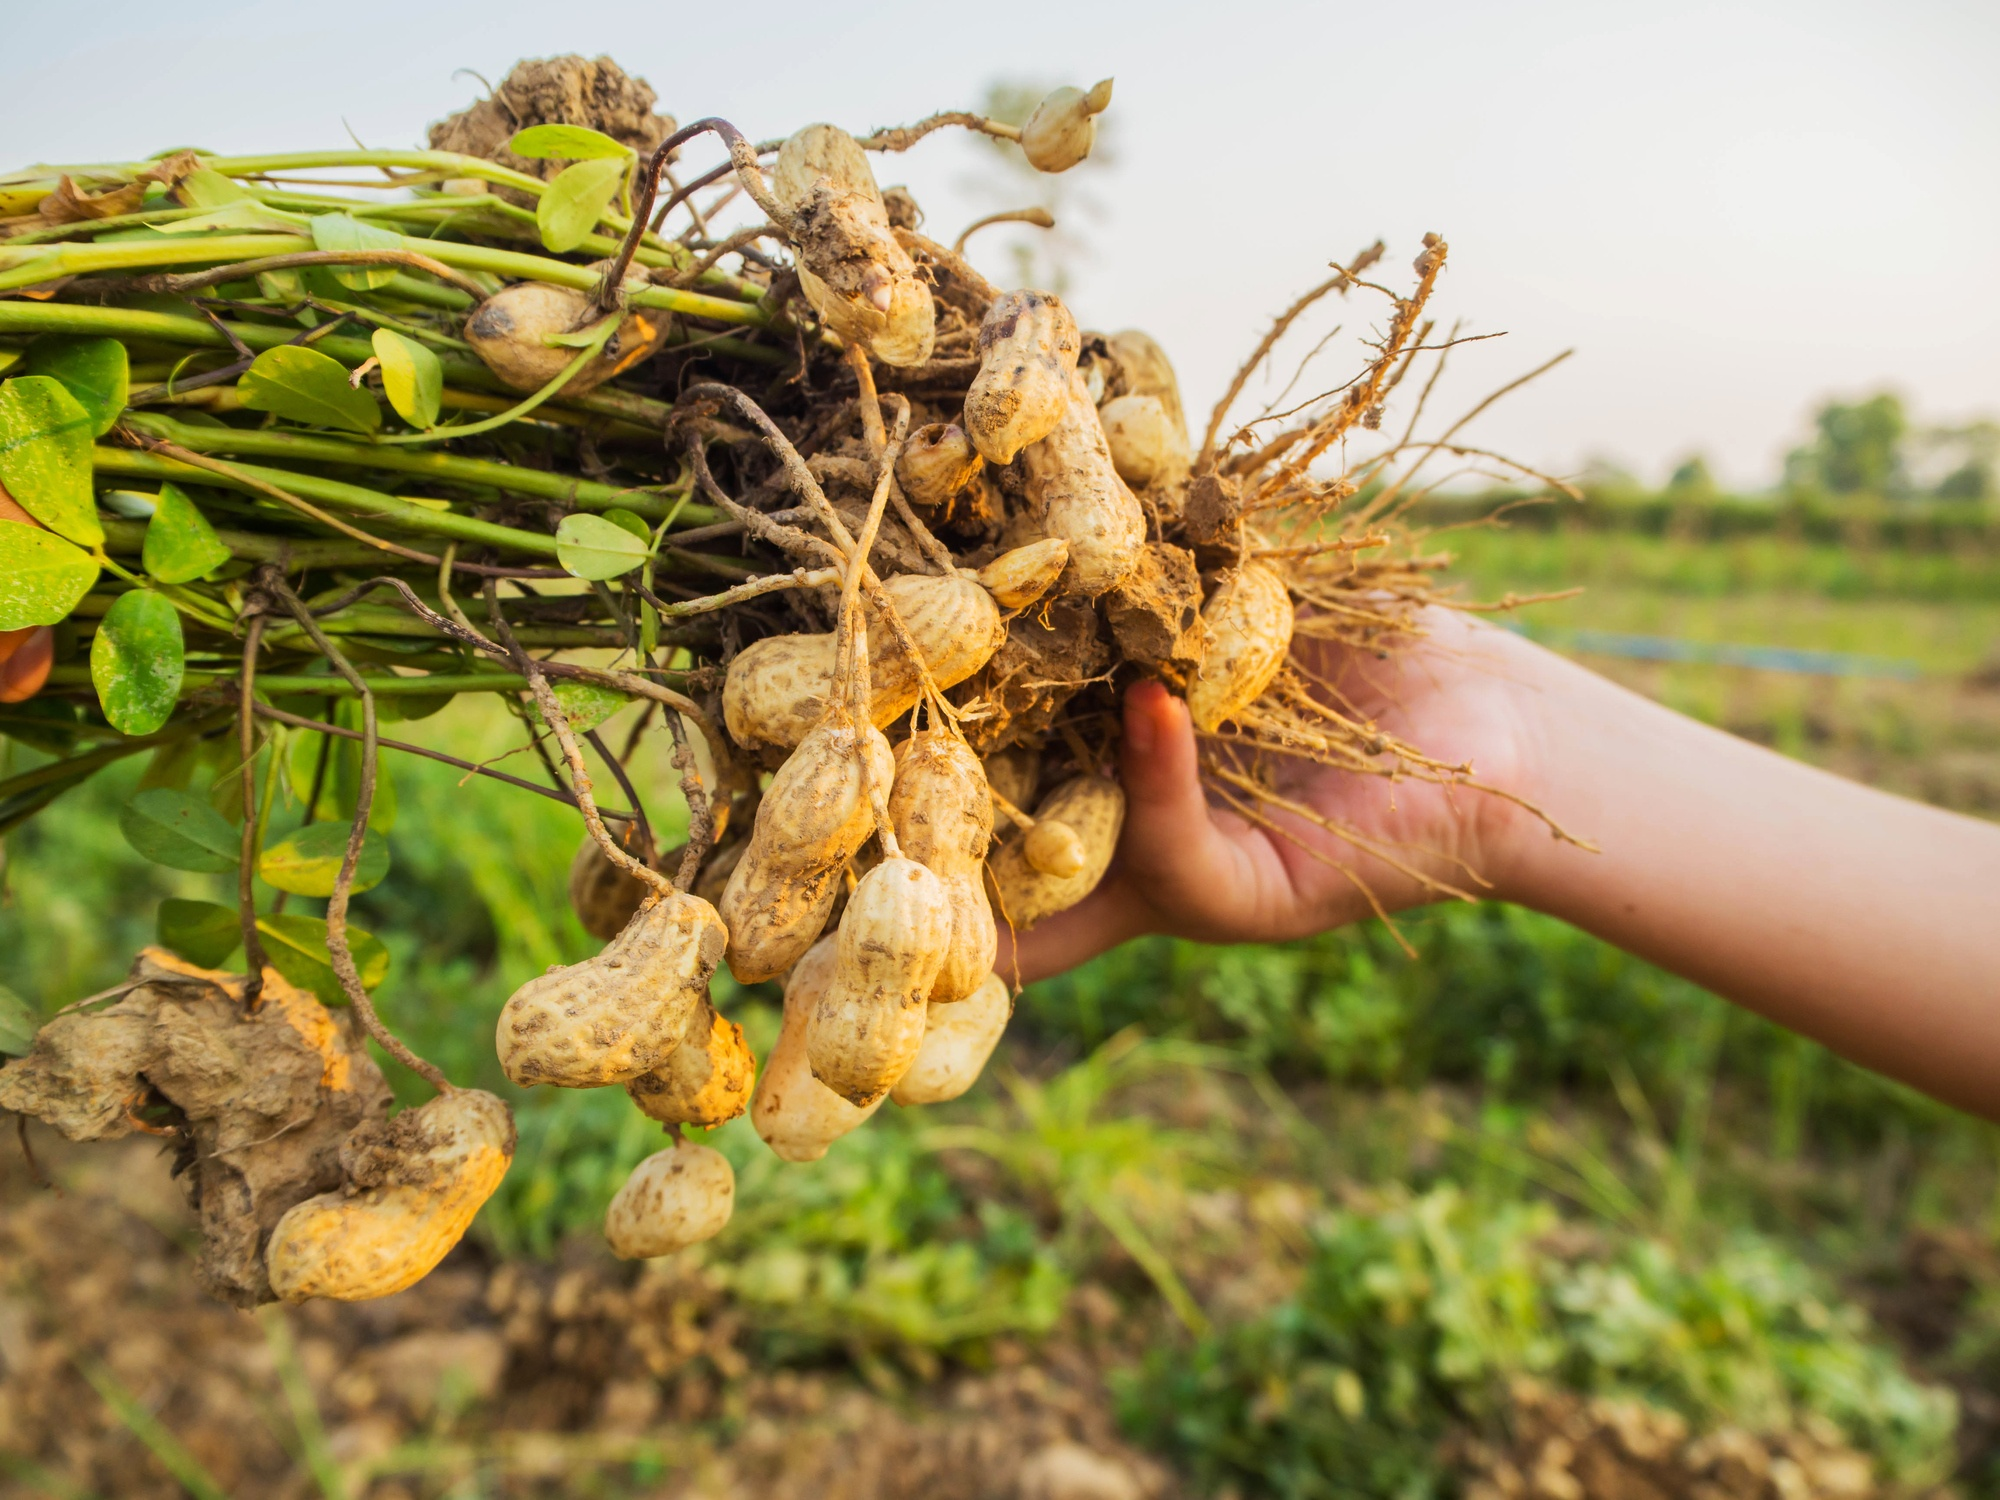 Duurzaam broodbeleg: pindakaas